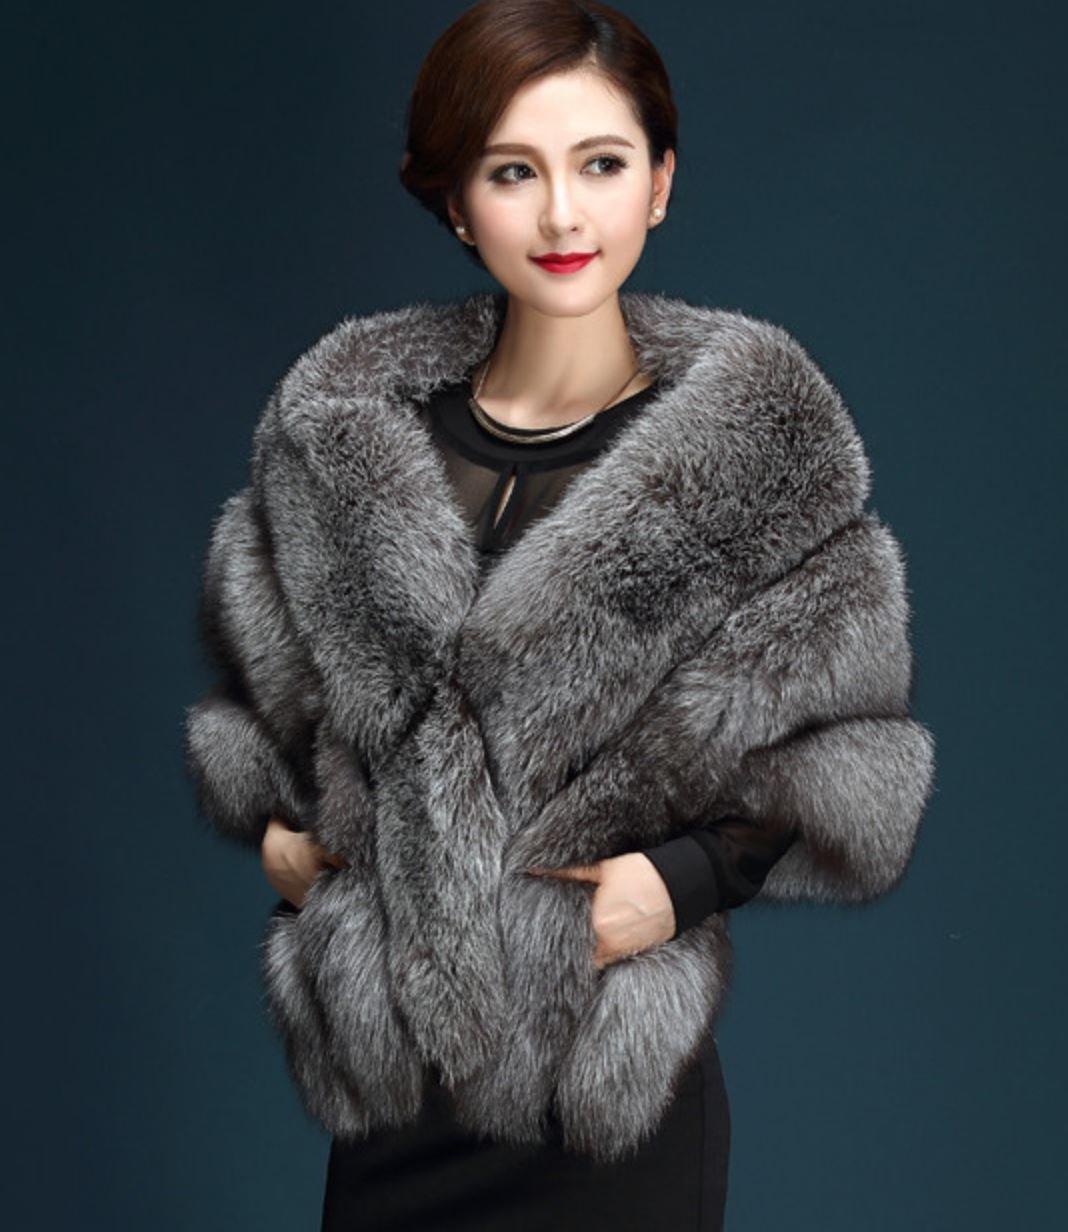 Gray Poncho for Winter Season Elegant Luxury Type Clothing for Women Gray Fur Vest